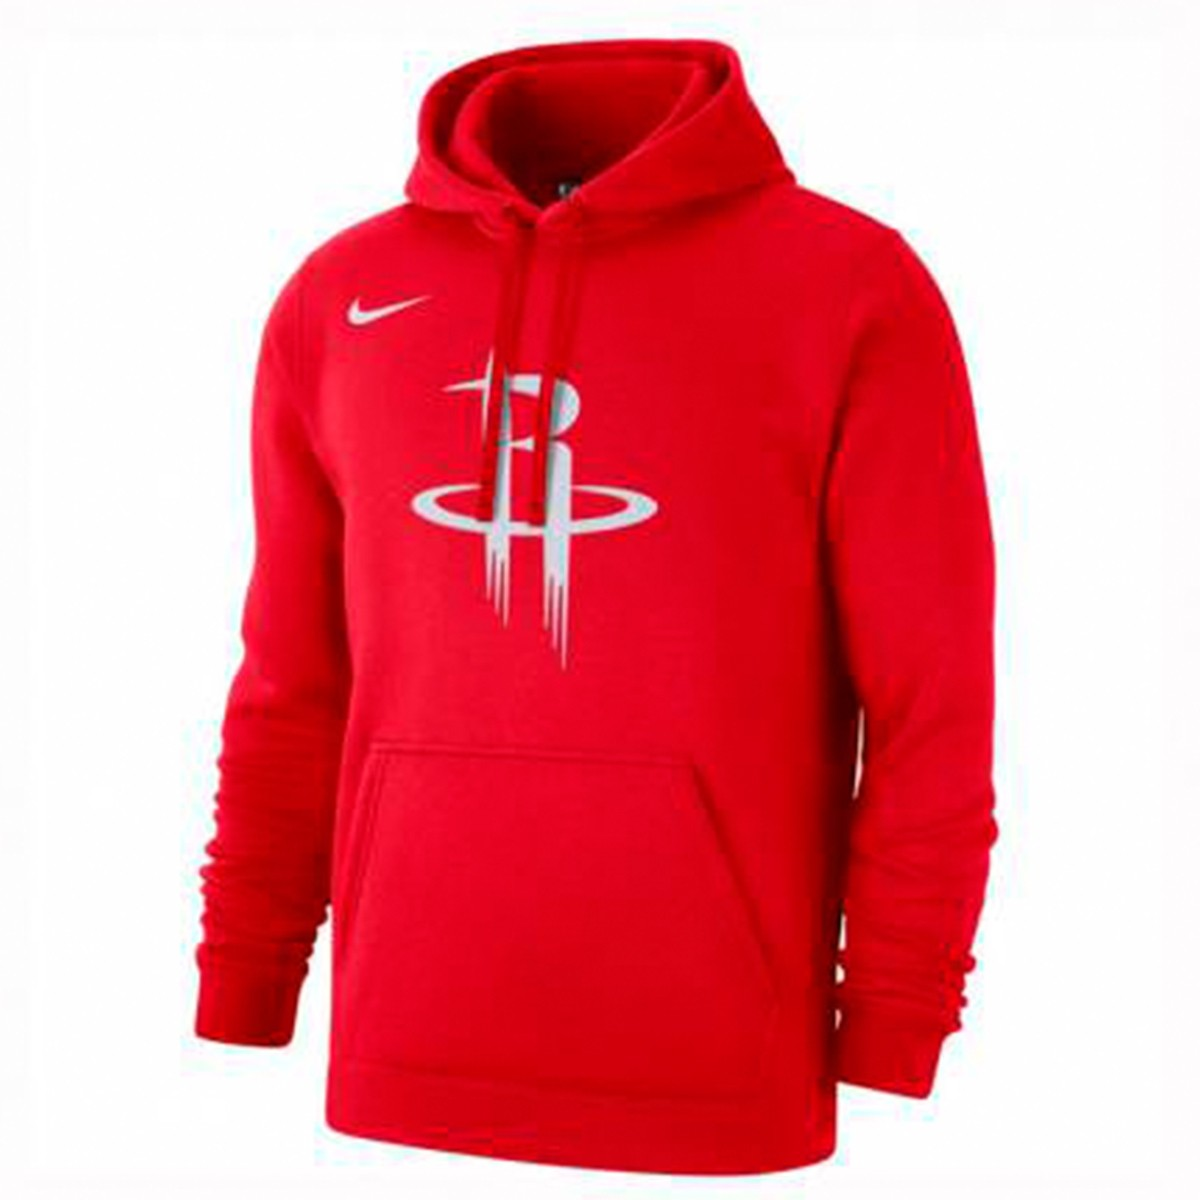 Nike Junior NBA Hoodie Logo 'Rockets'